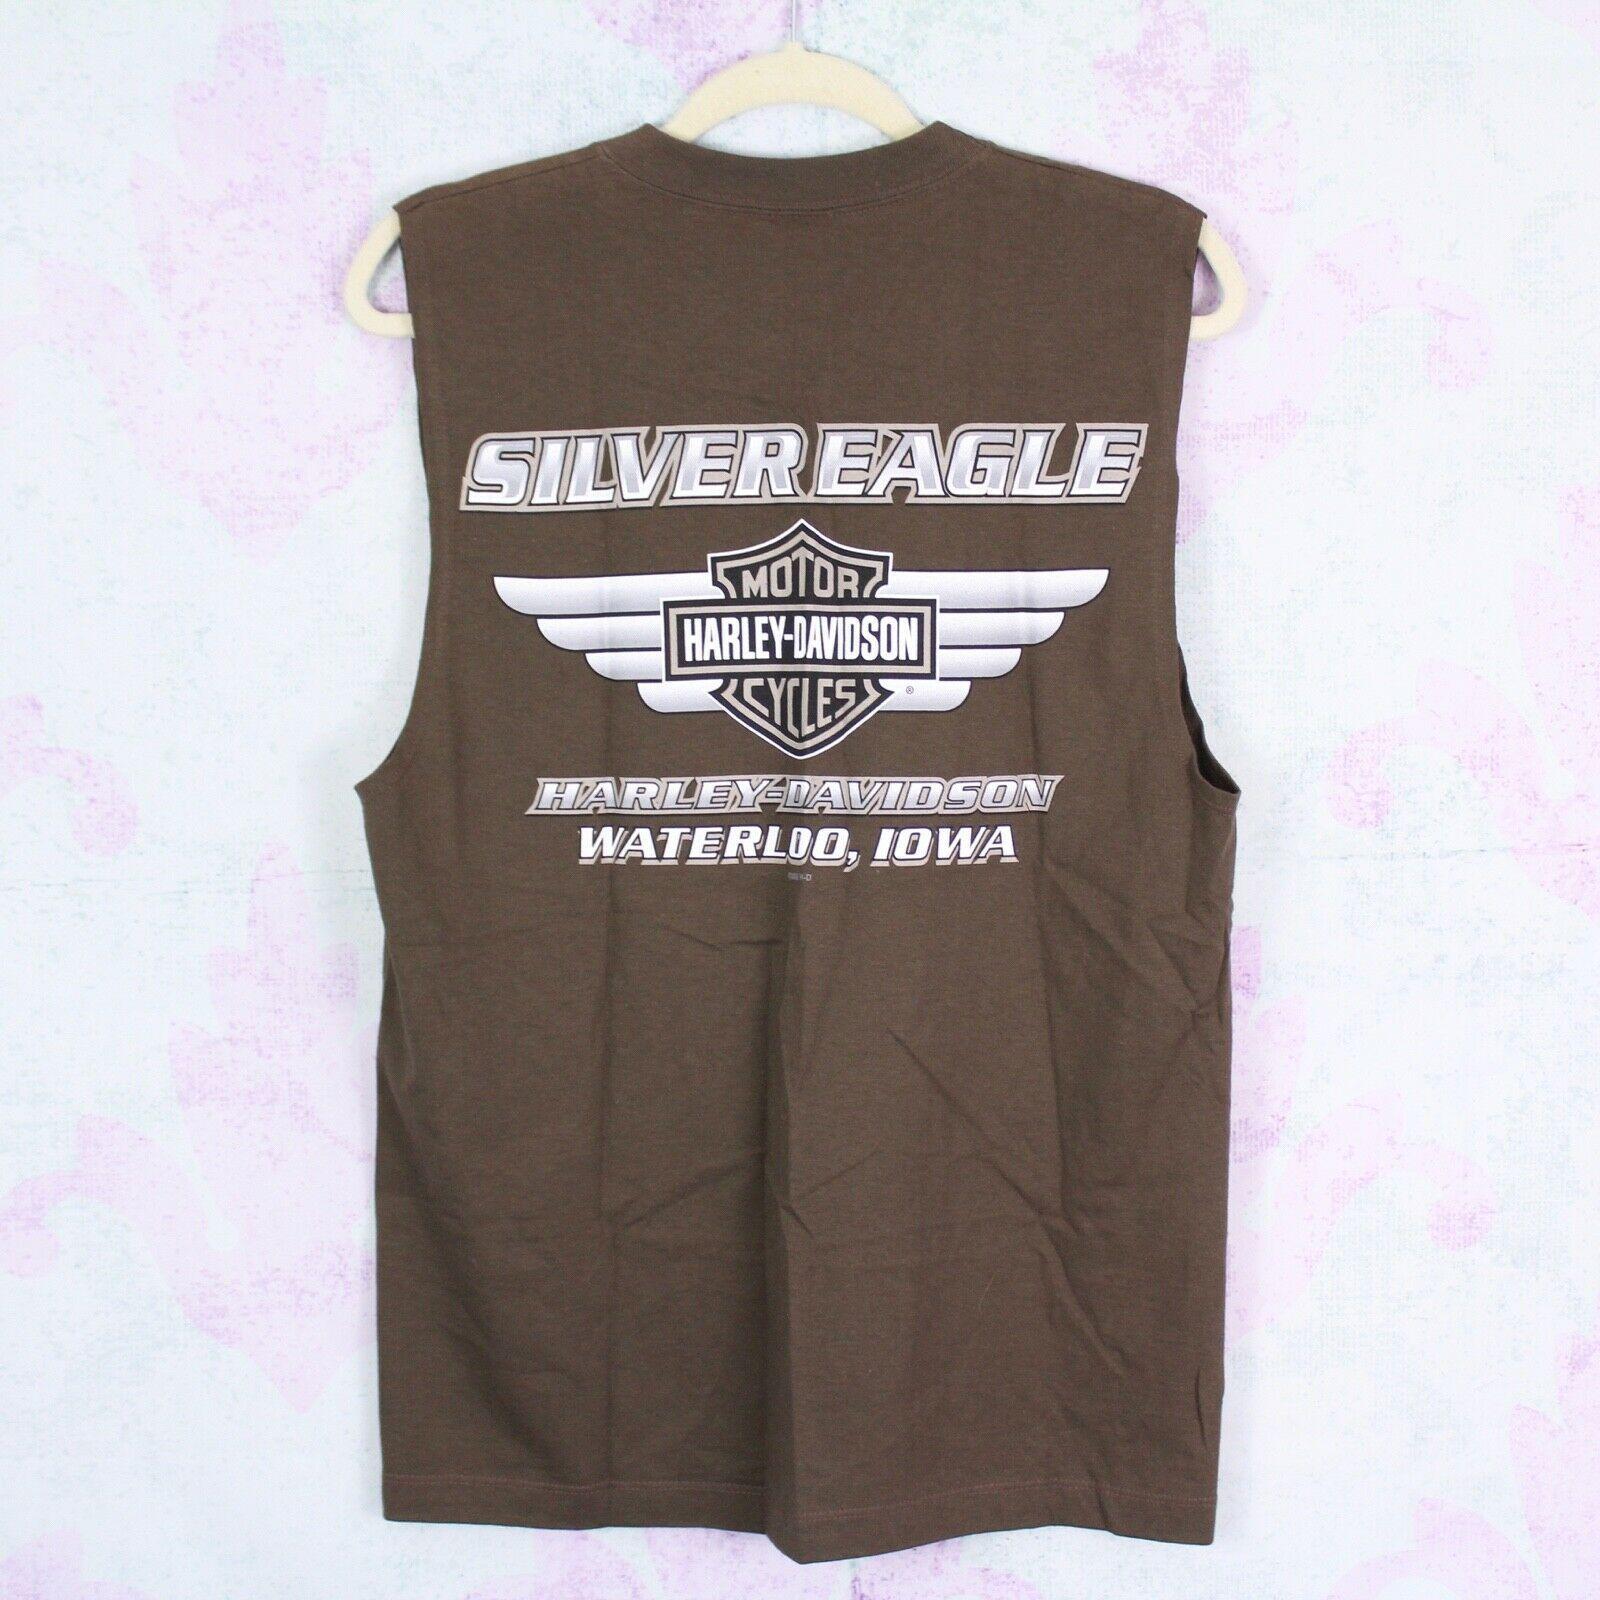 Harley Davidson Men's Medium M Waterloo, IA Graphic Tee Muscle T-Shirt Tank Top image 2